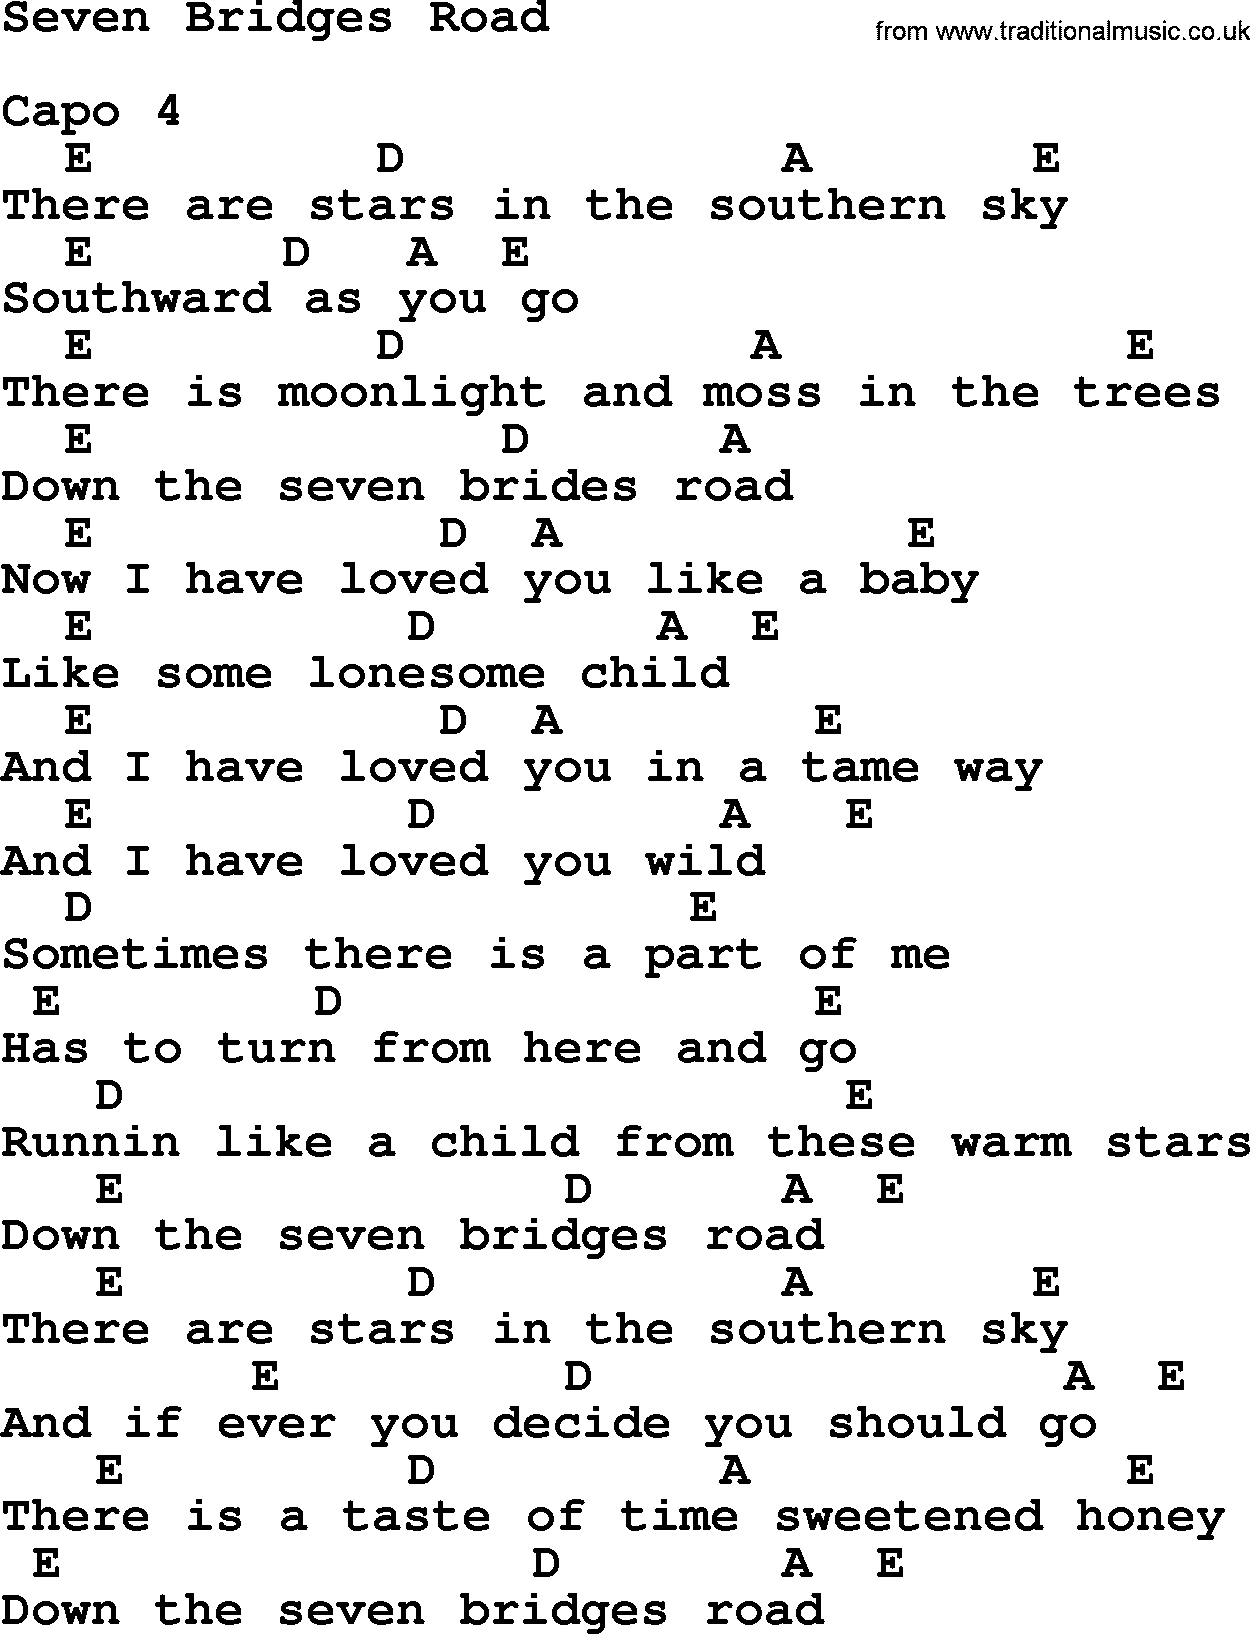 Dolly Parton Song Seven Bridges Road Lyrics And Chords I Sort Of